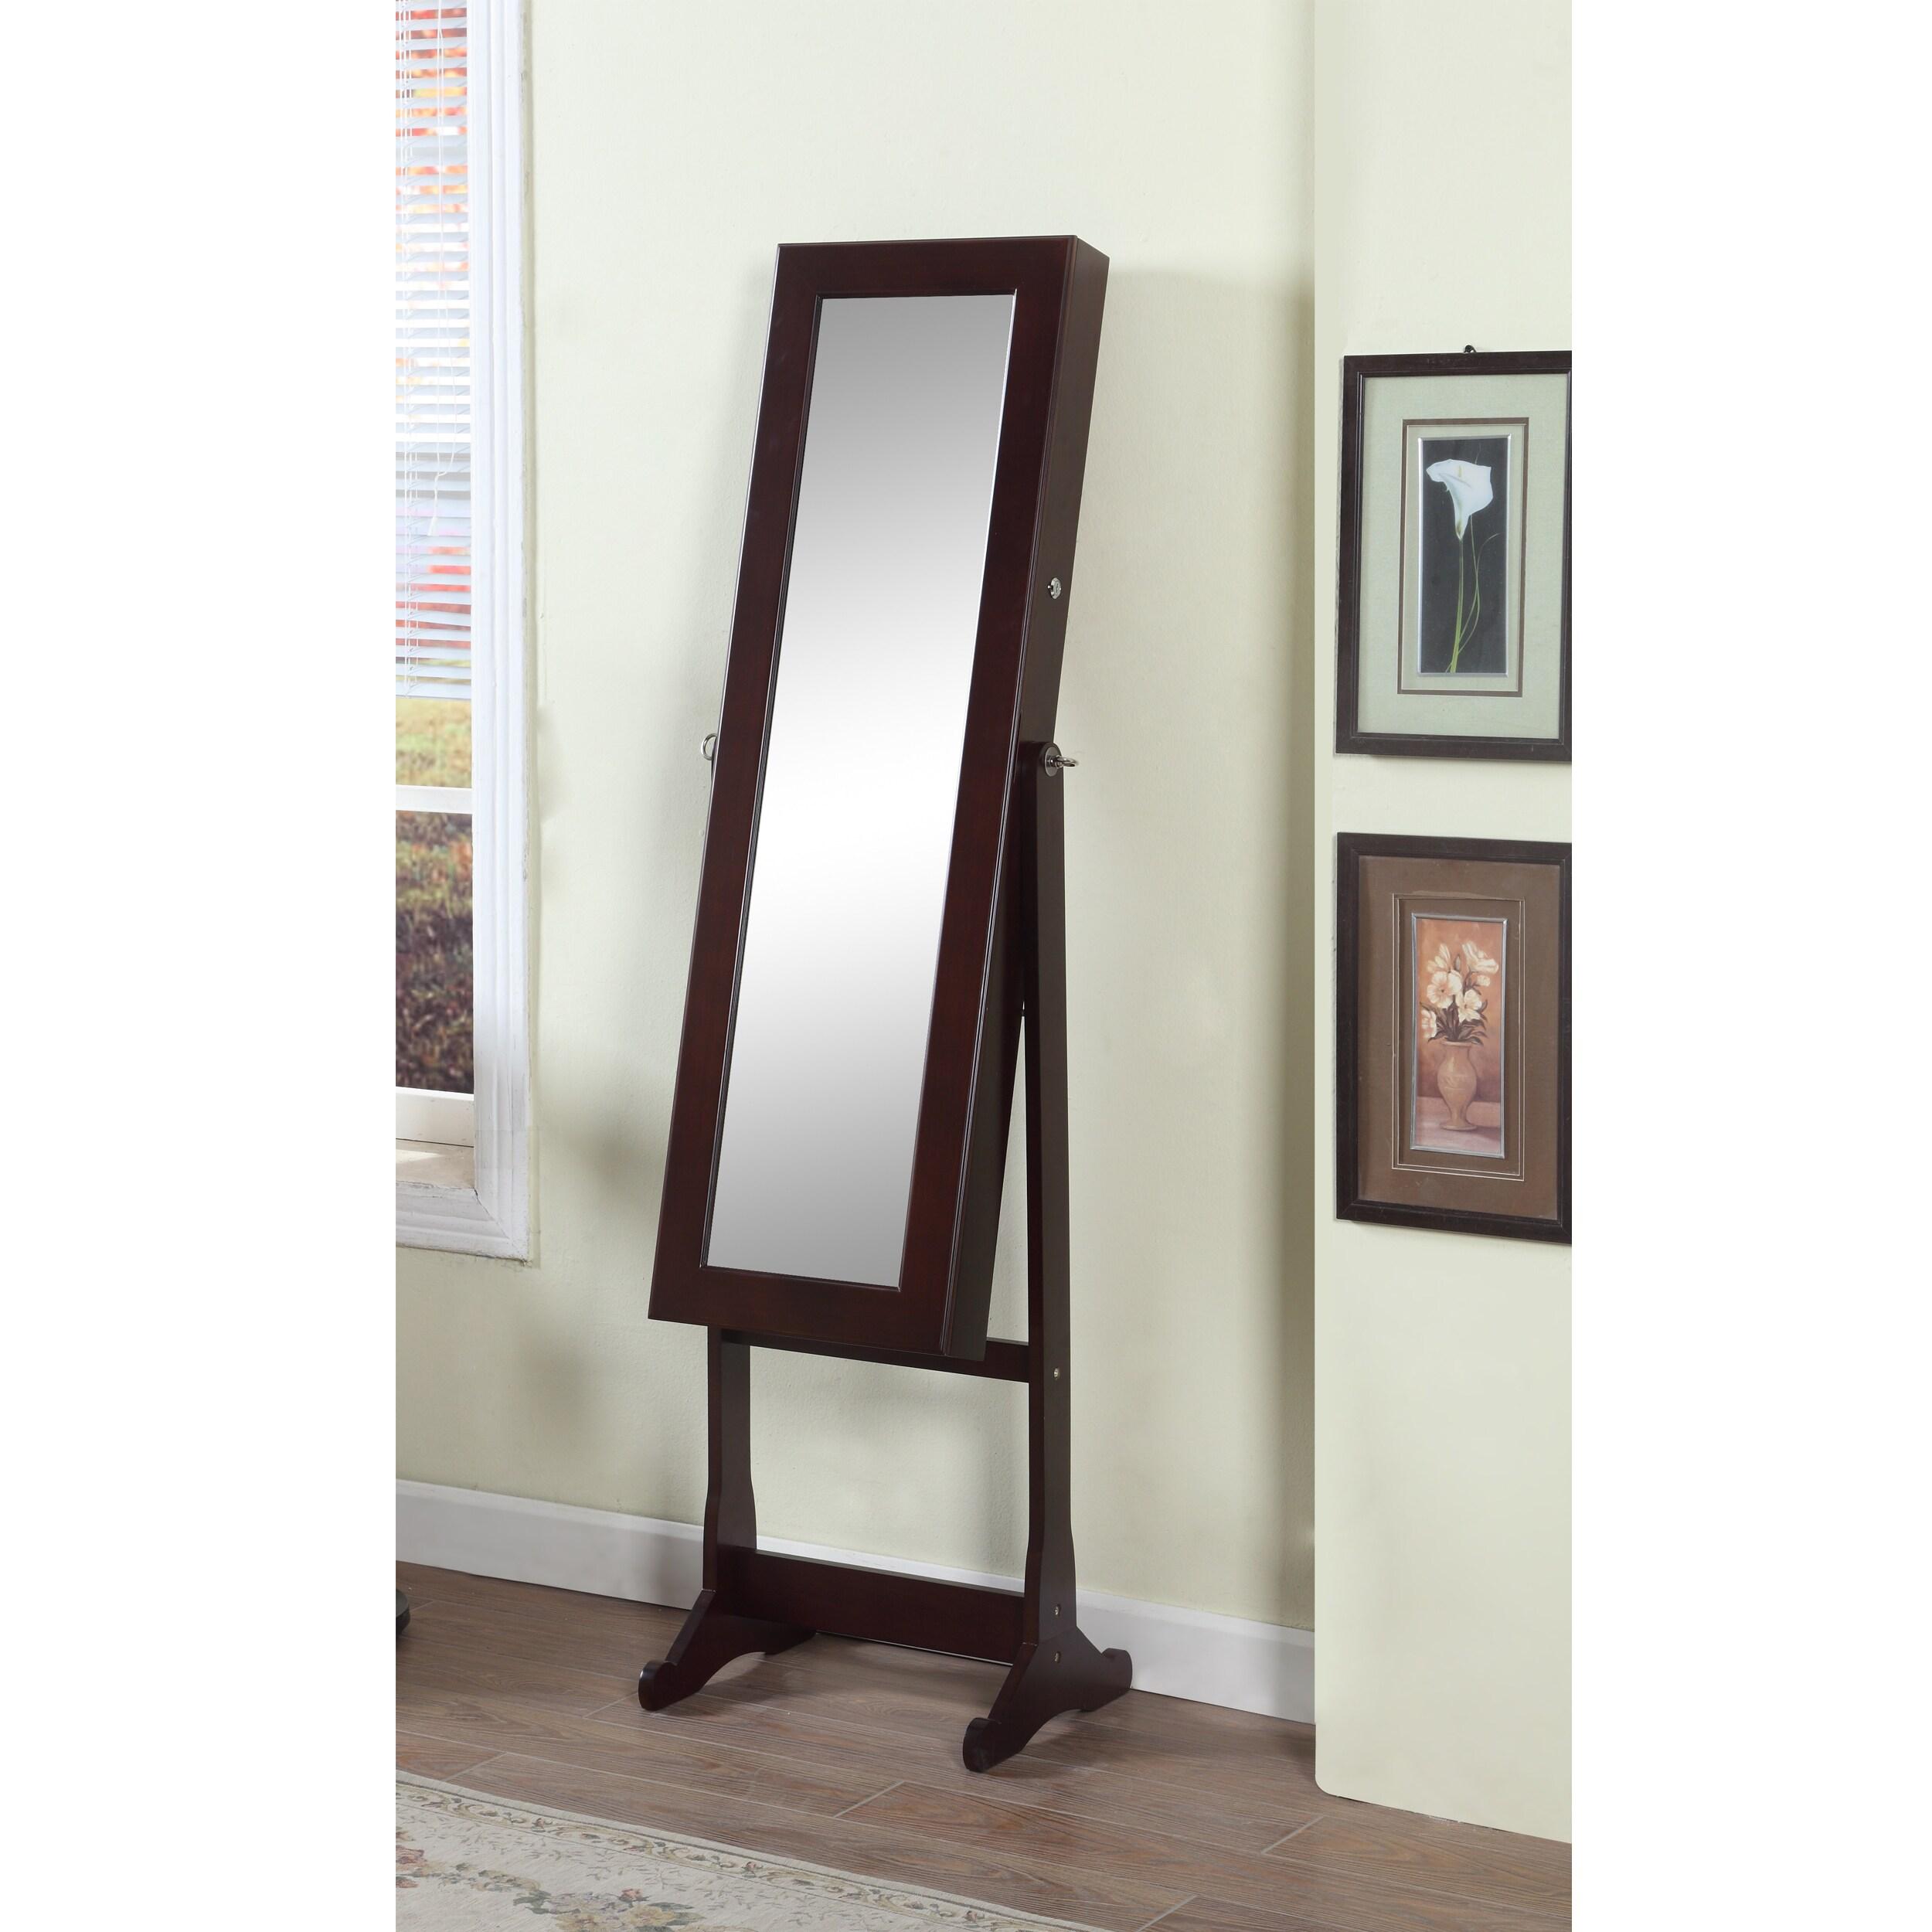 Artiva USA Walnut 63-inch Floor-standing Mirror and Jewelry Armoire ...